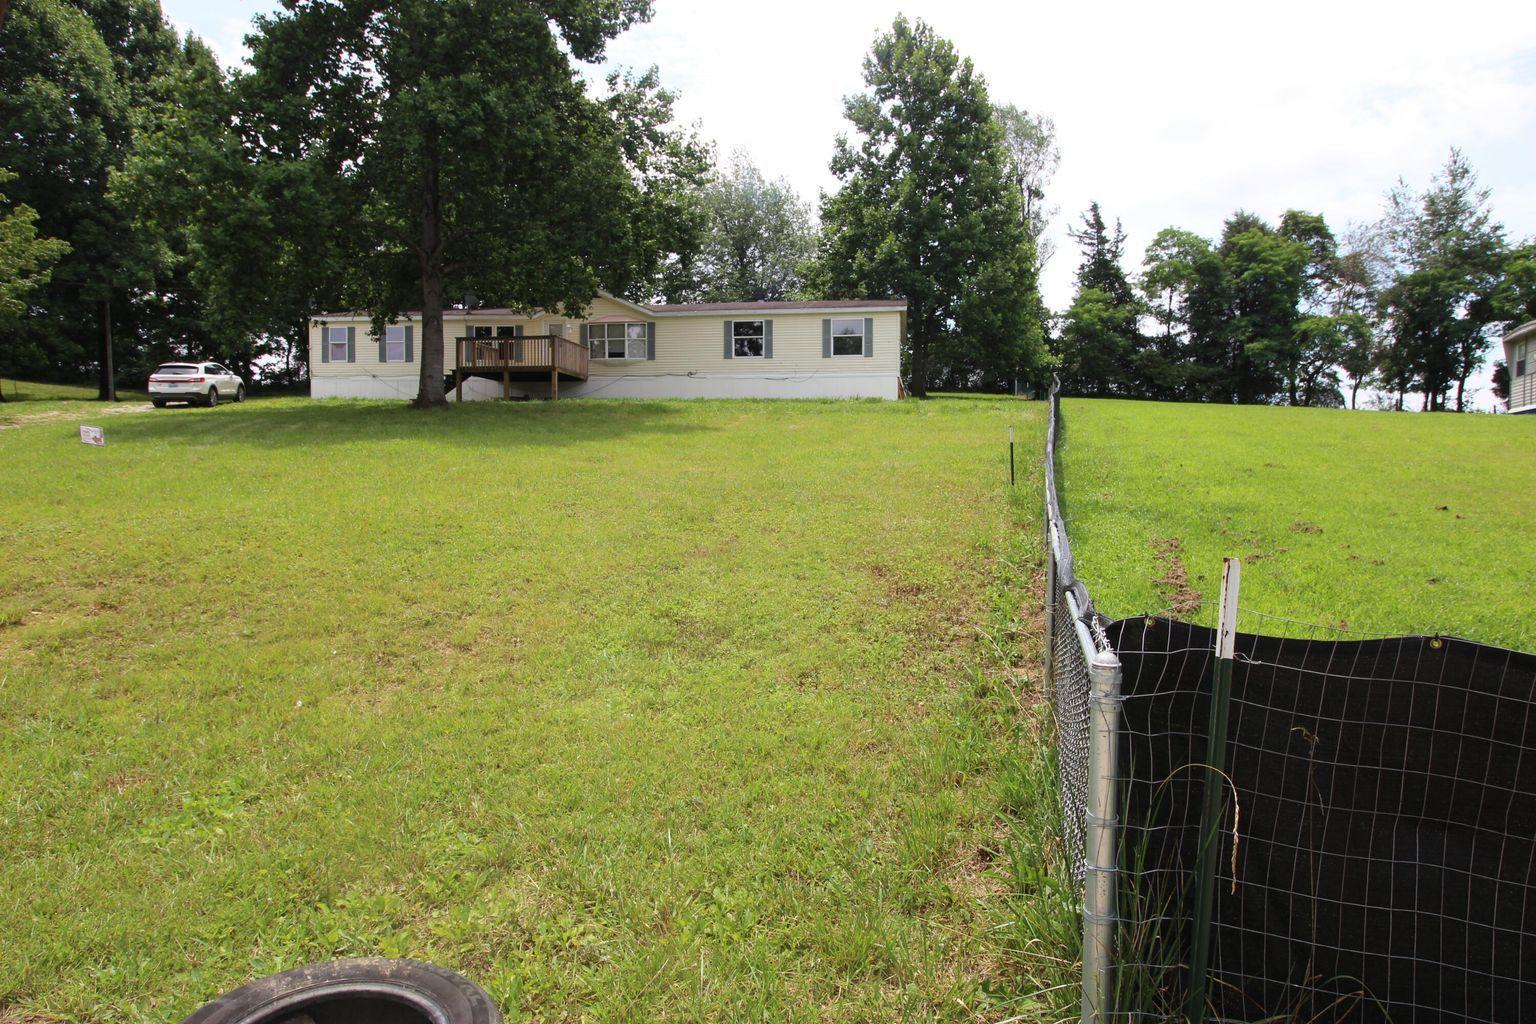 61 Lana Lane, Science Hill, KY 42553